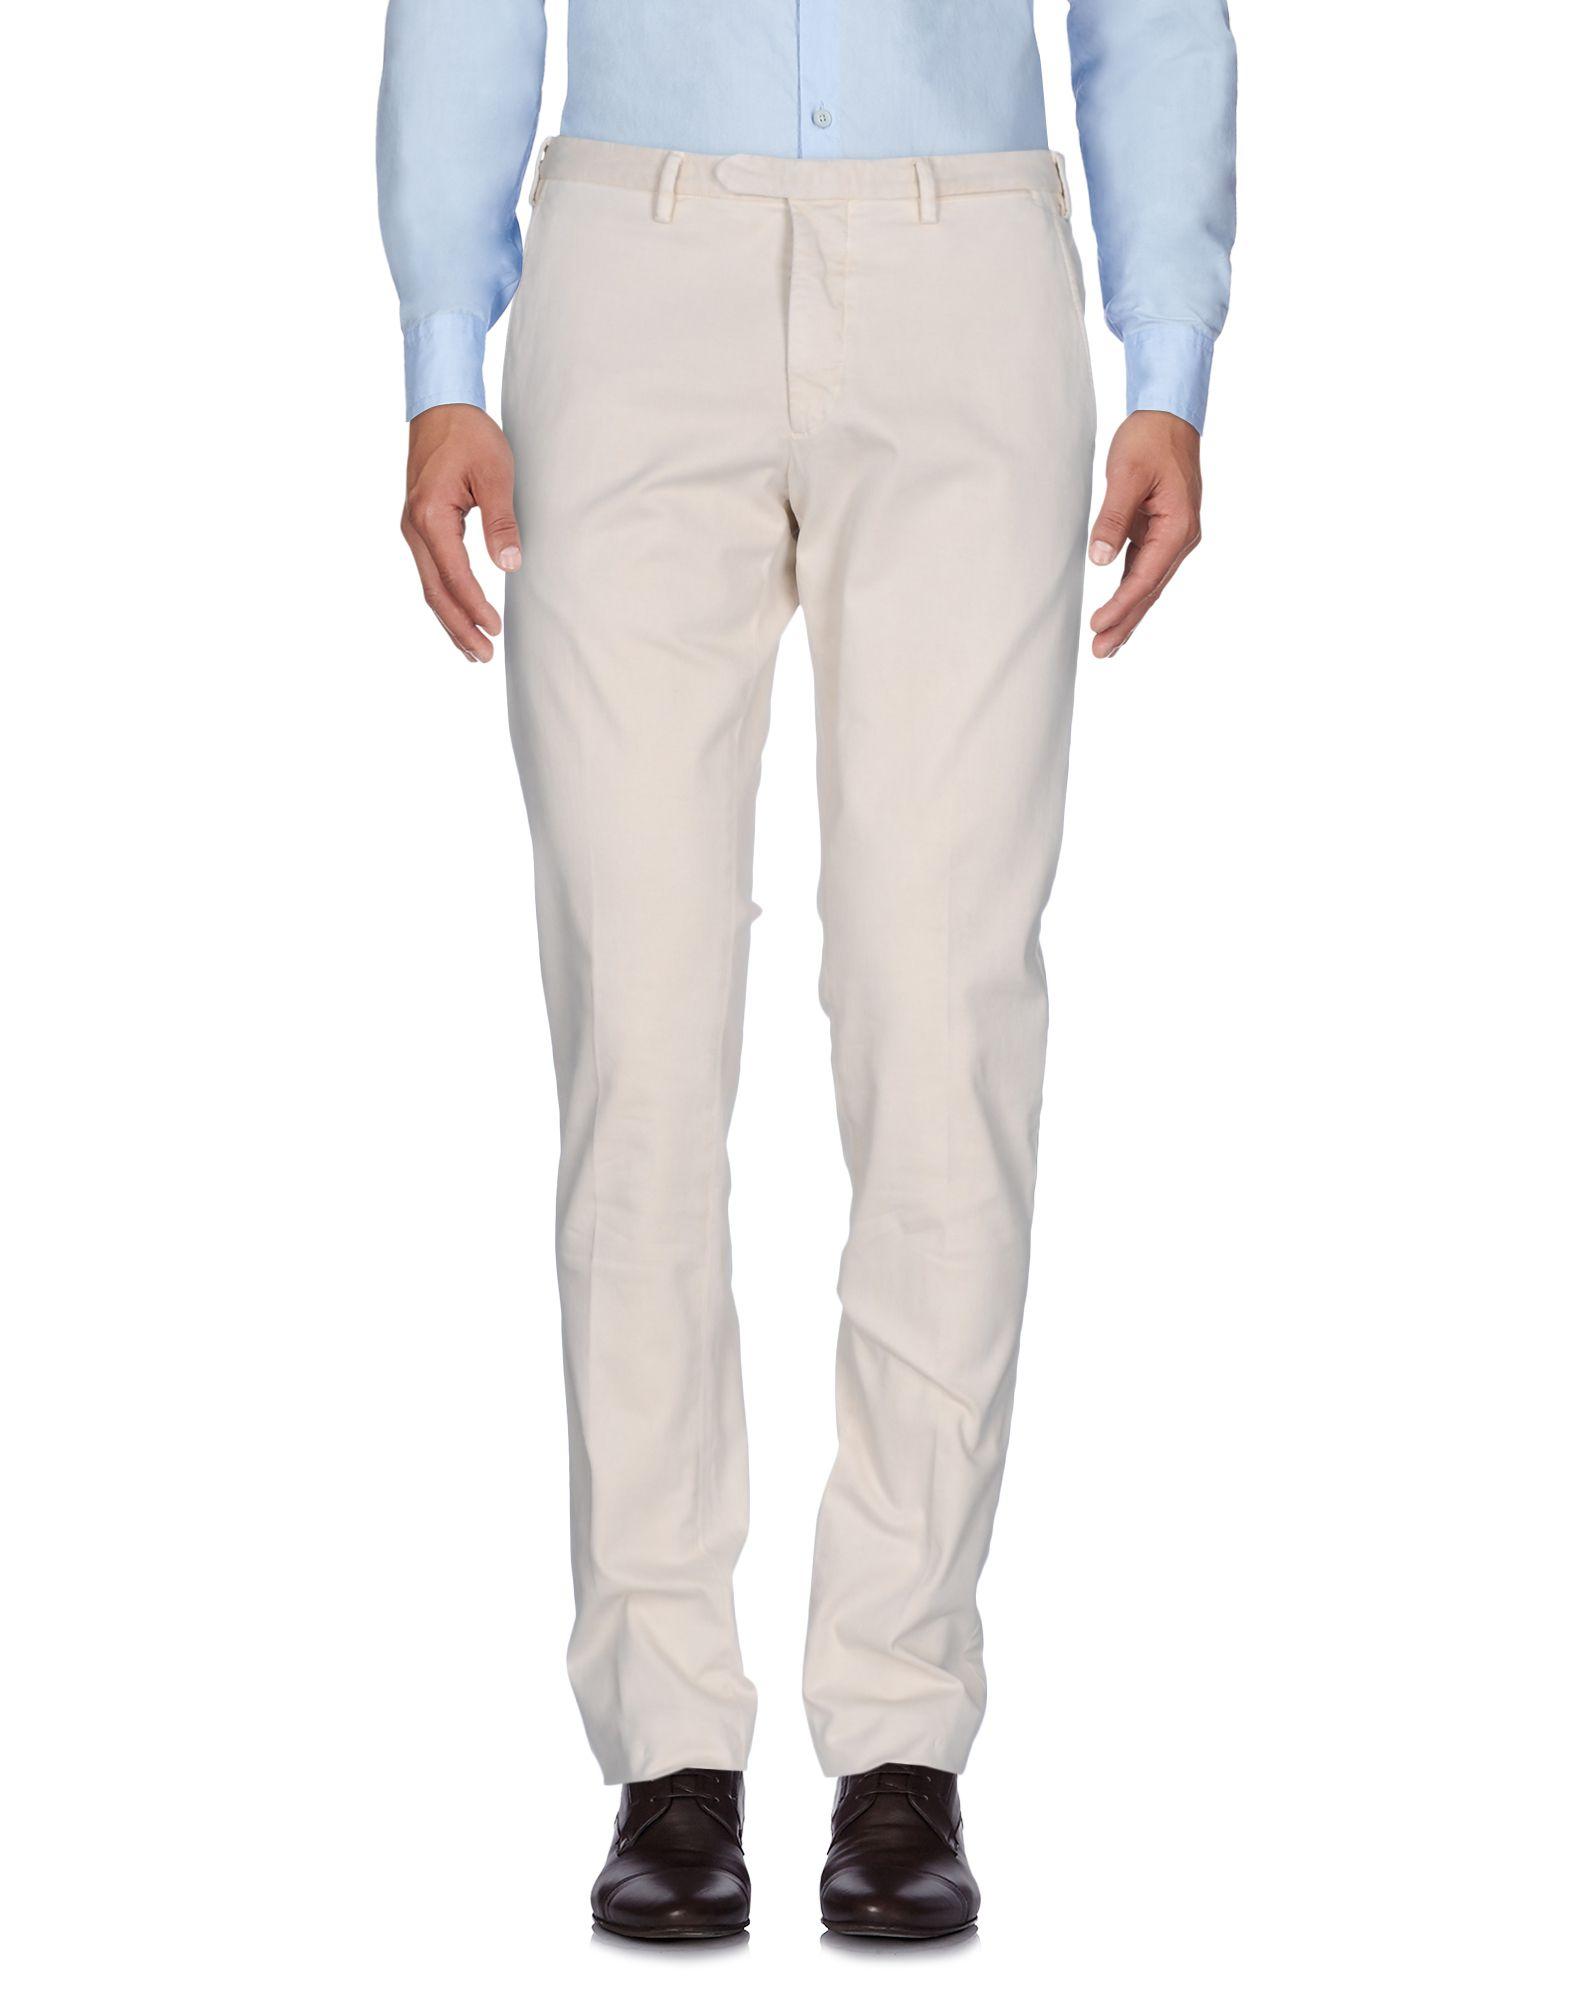 SANTANIELLO Napoli Повседневные брюки santaniello napoli повседневные брюки